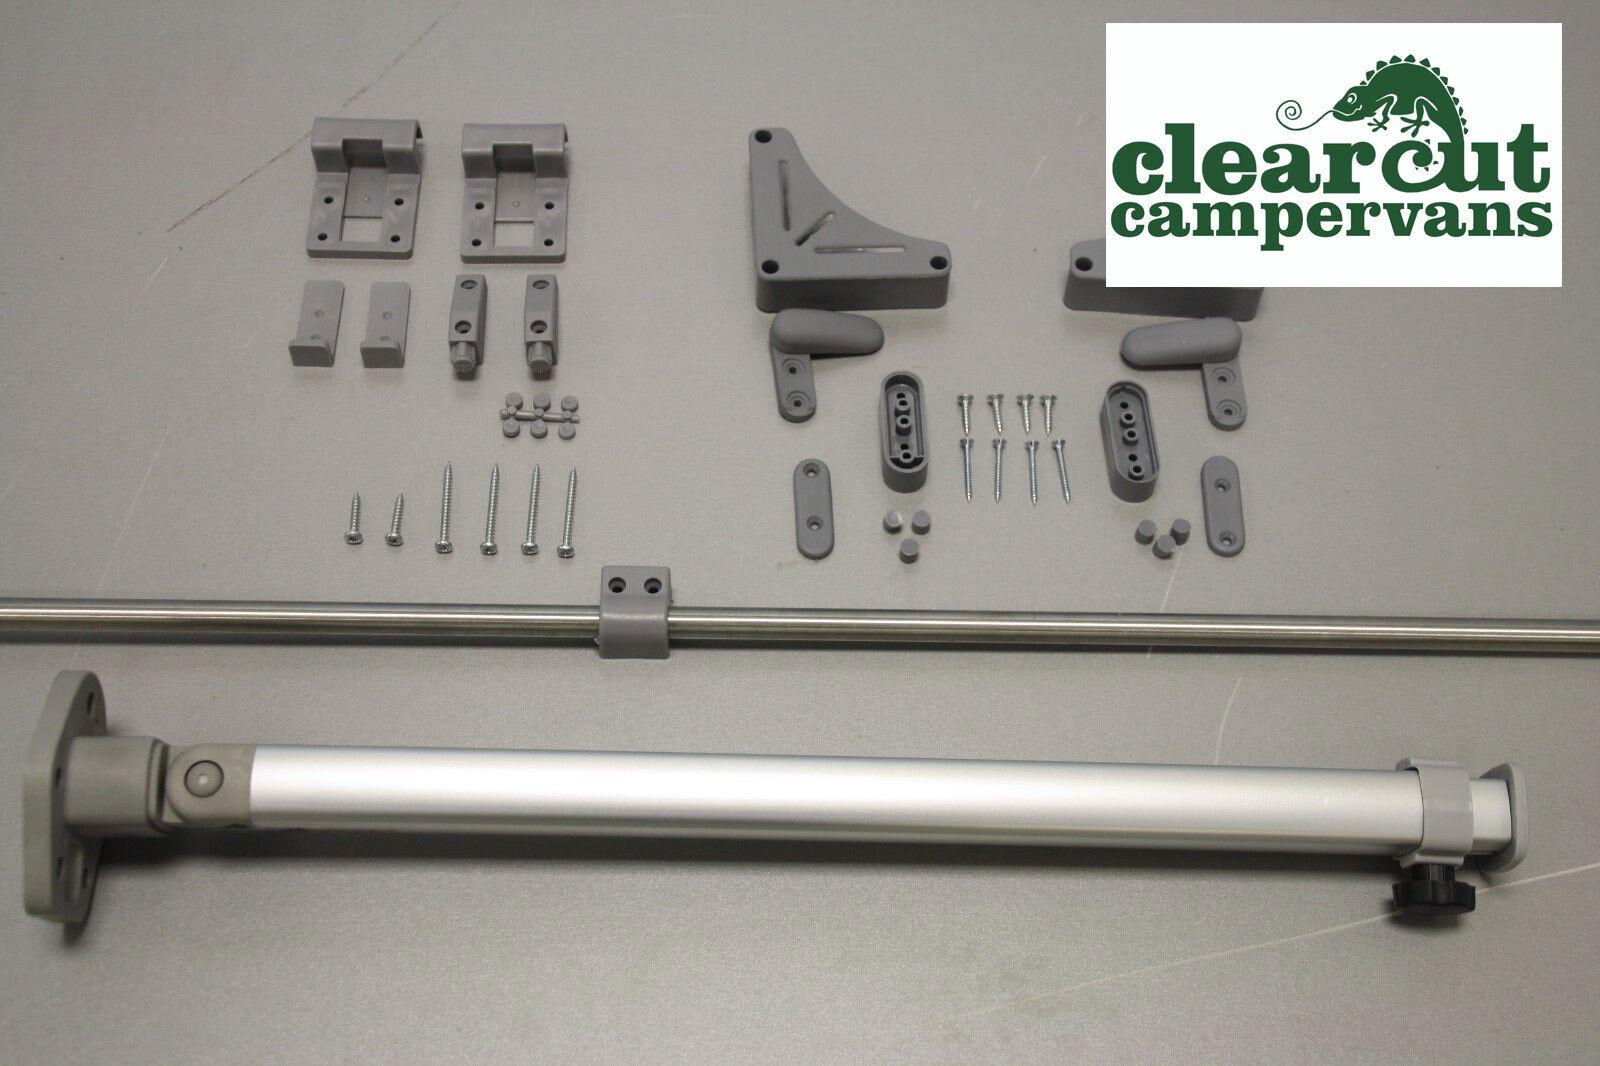 REIMO FOLDING TABLE LEG VW T5 CAMPERVAN ADJUSTABLE TABLE LEG AND RAIL KIT